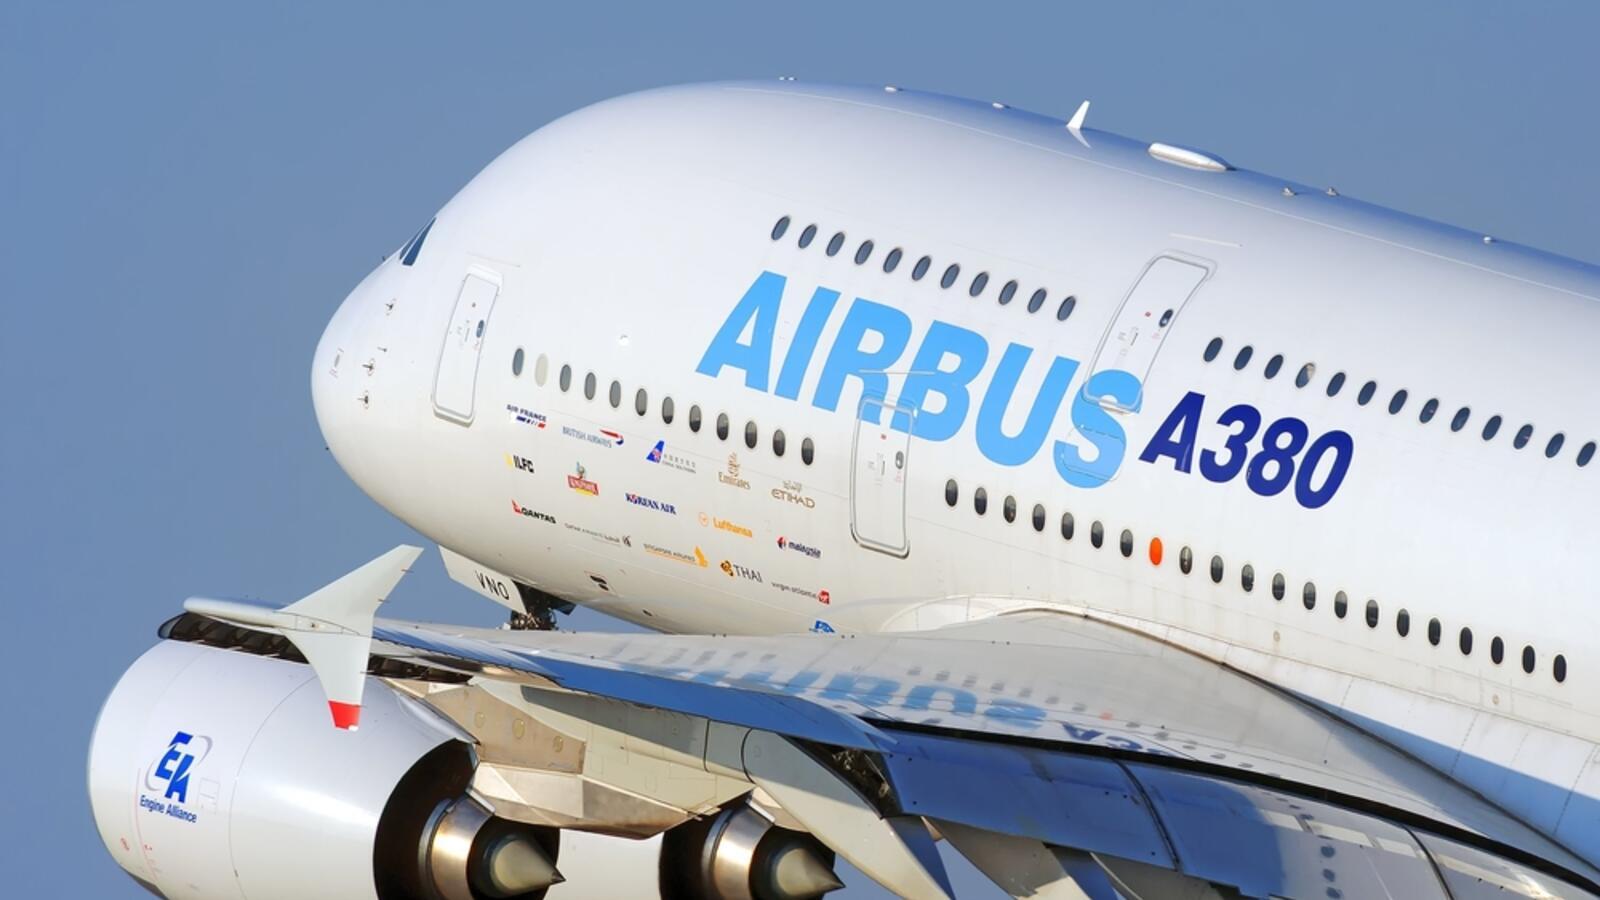 airbus-shutterstock-12Jan20